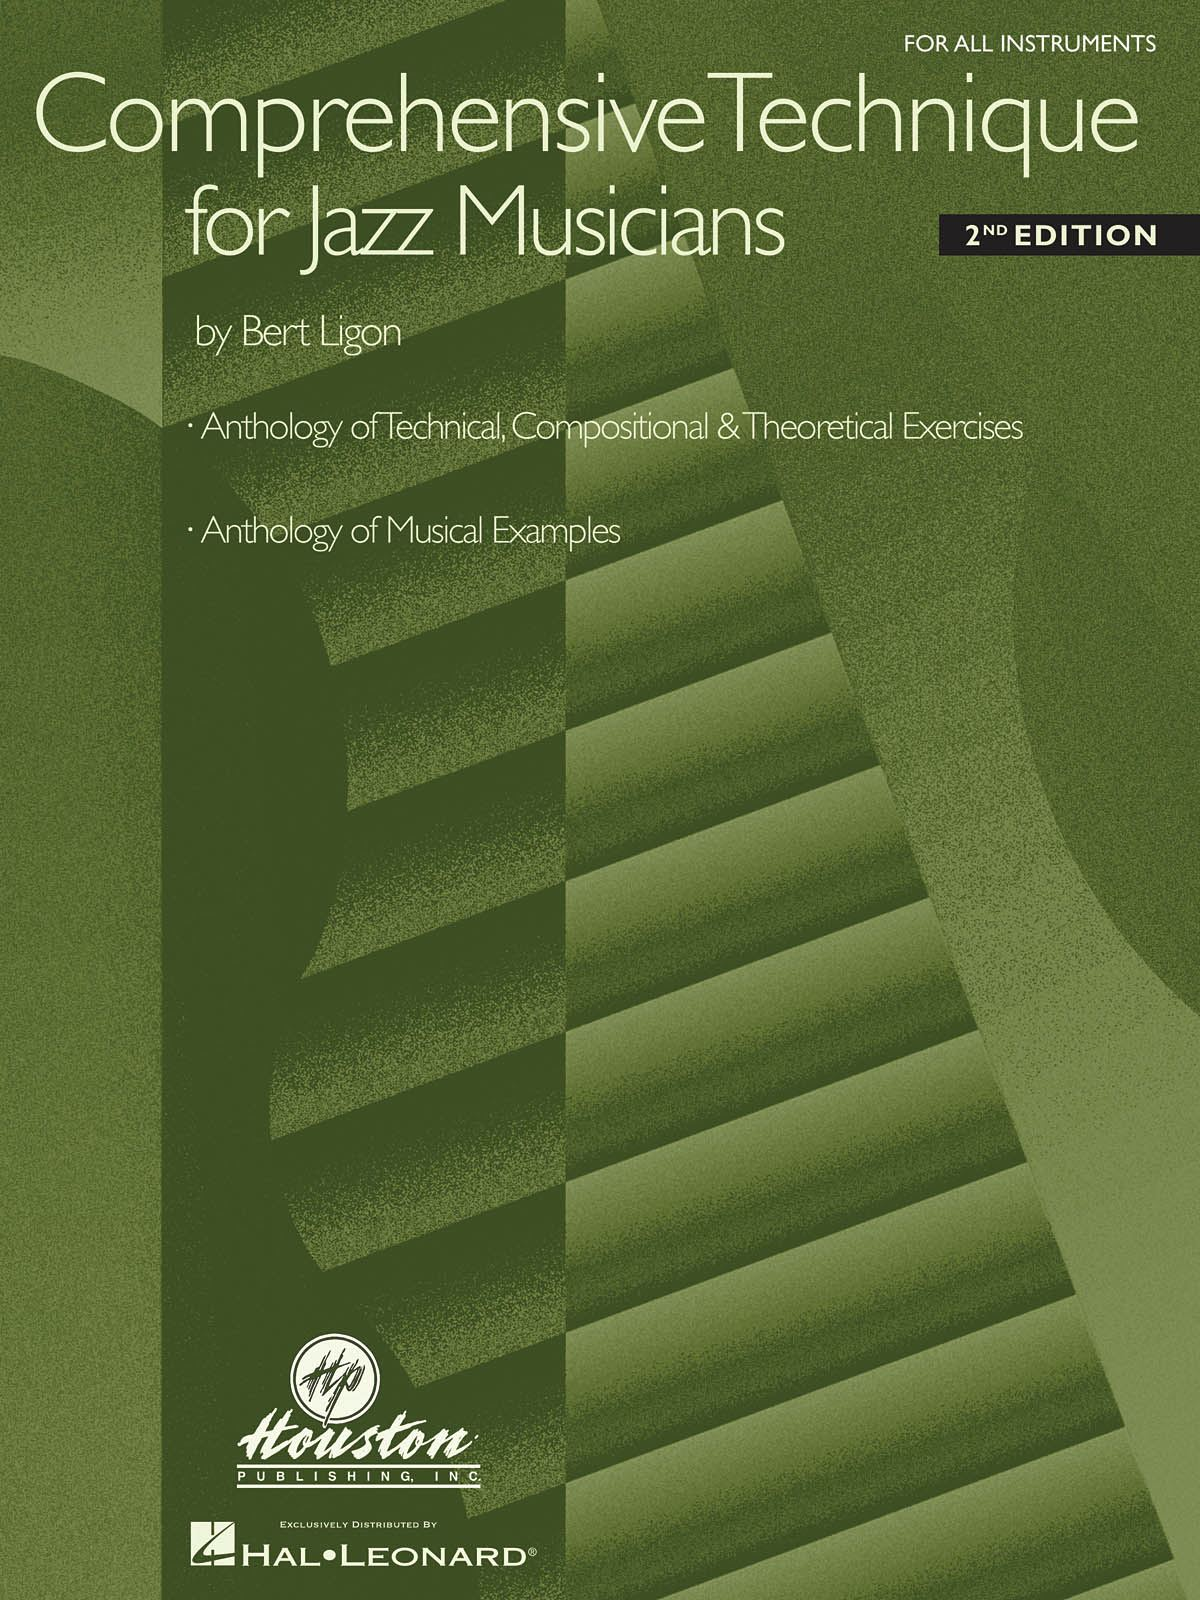 Bert Ligon: Comprehensive Technique For Jazz Musicians-2nd Ed.: Guitar Solo: